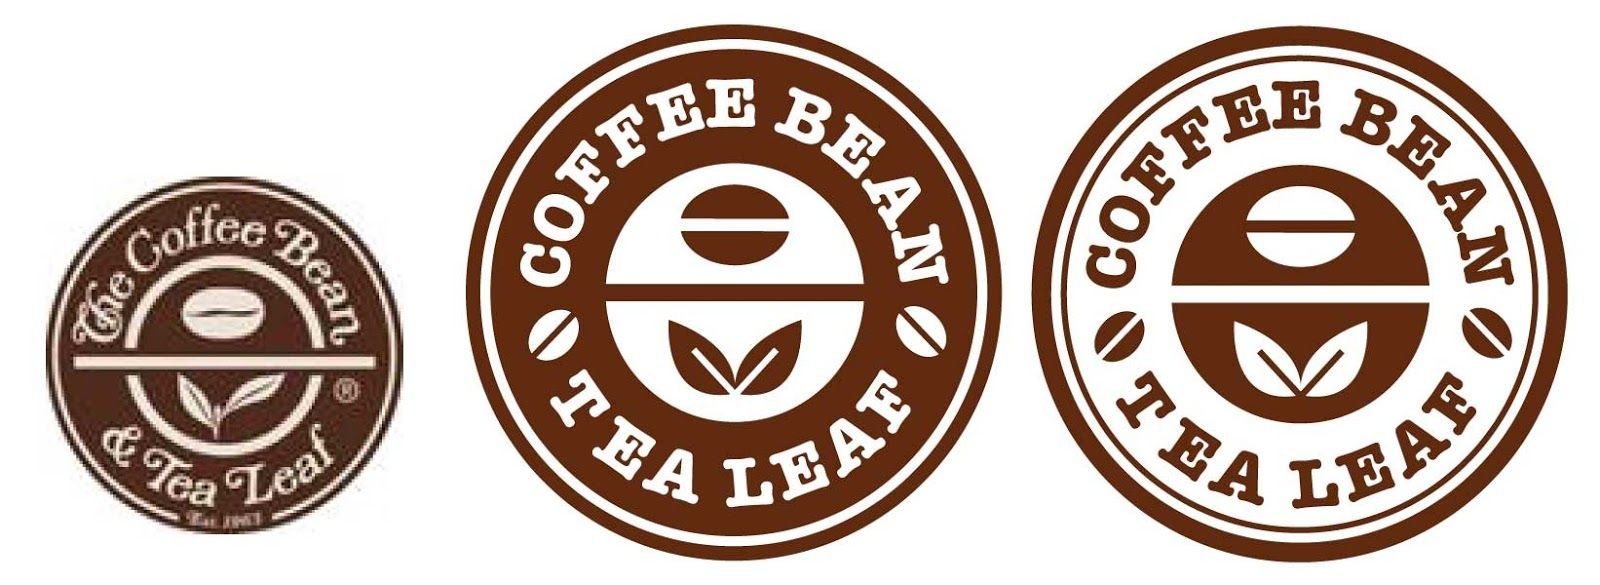 Pin On Coffee Lovers